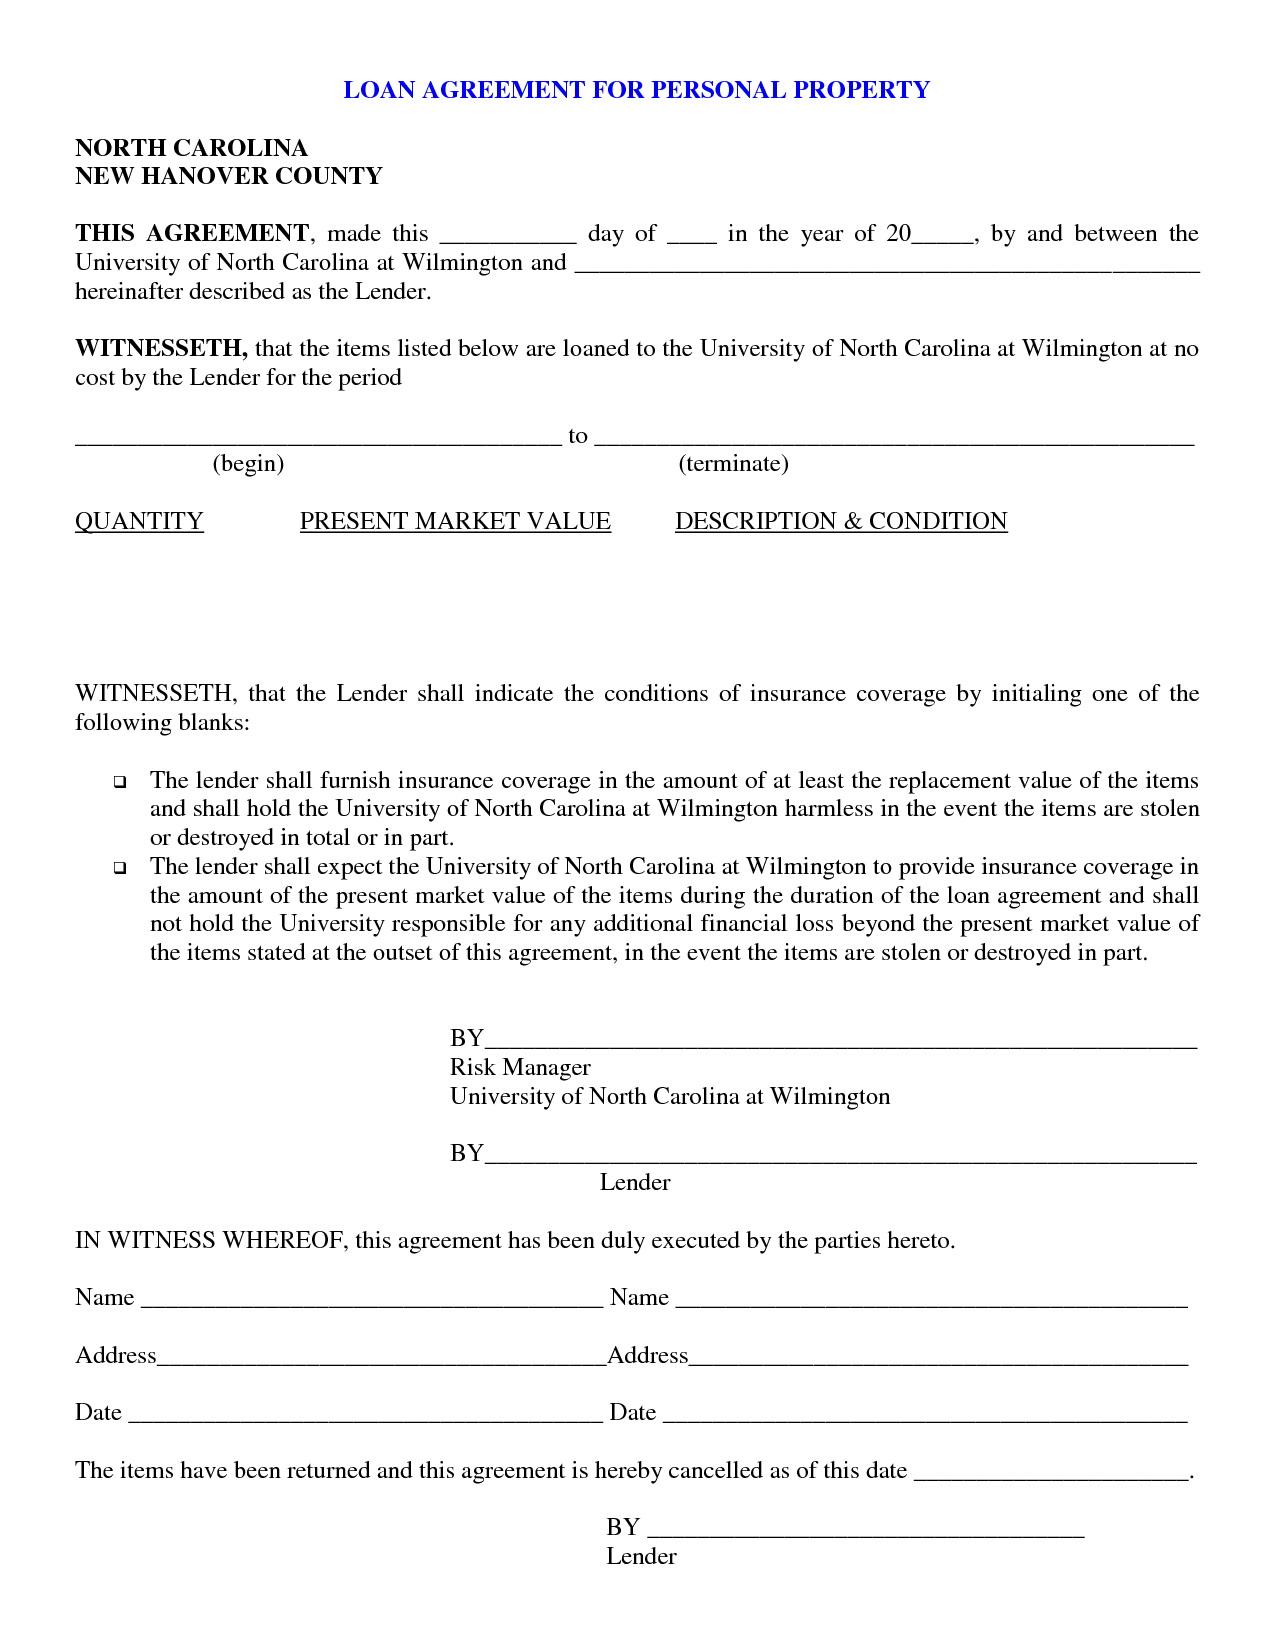 Sample Loan Agreement Template Free